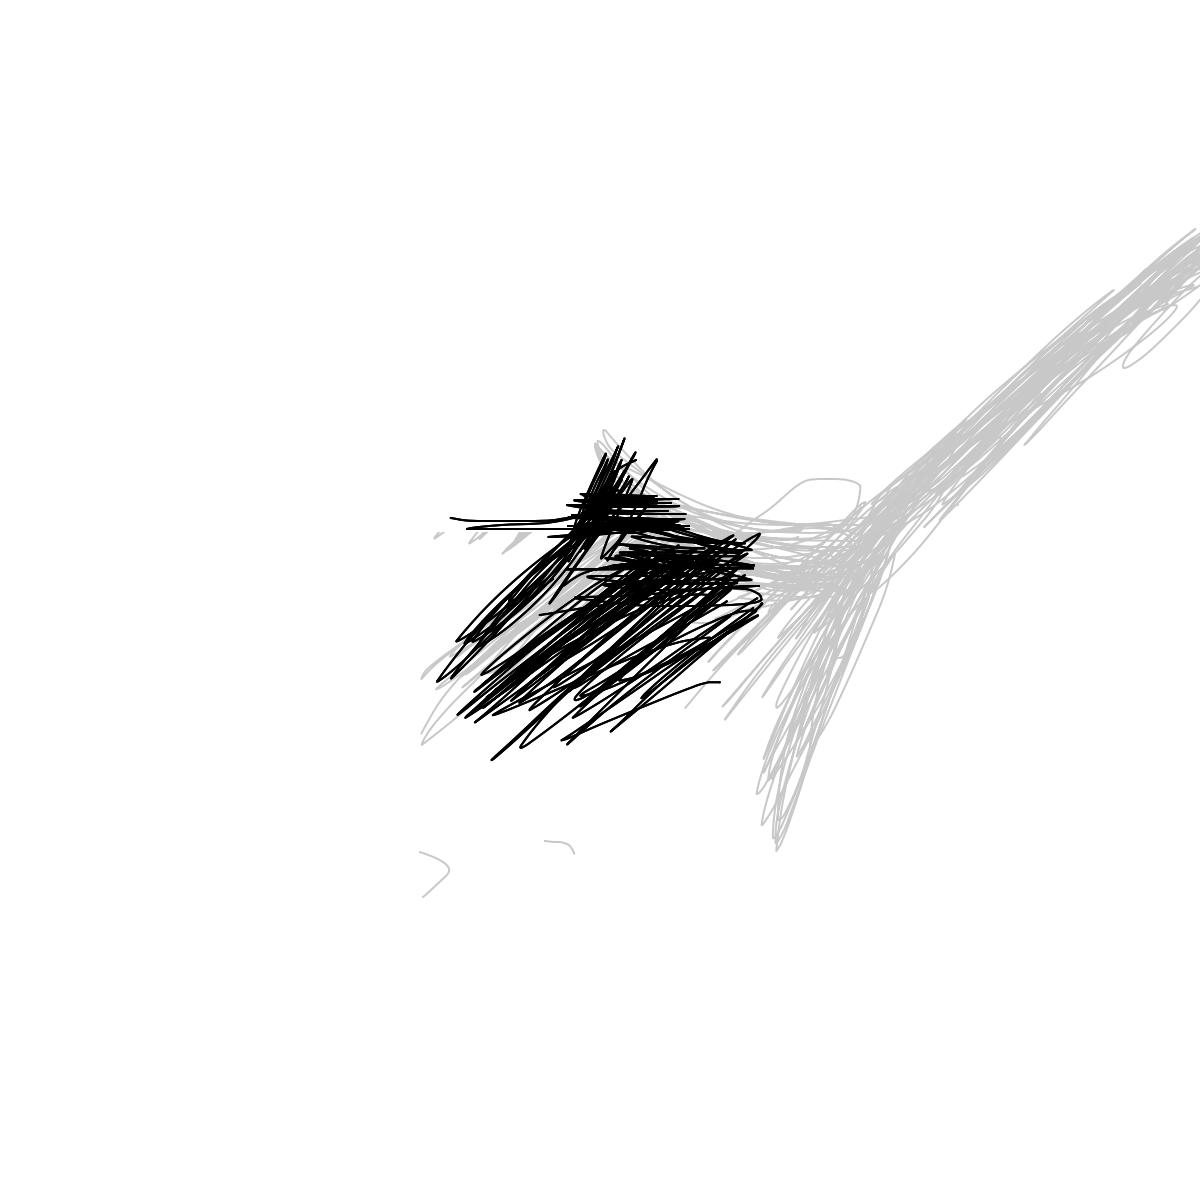 BAAAM drawing#23711 lat:33.8834533691406250lng: -84.1022567749023400